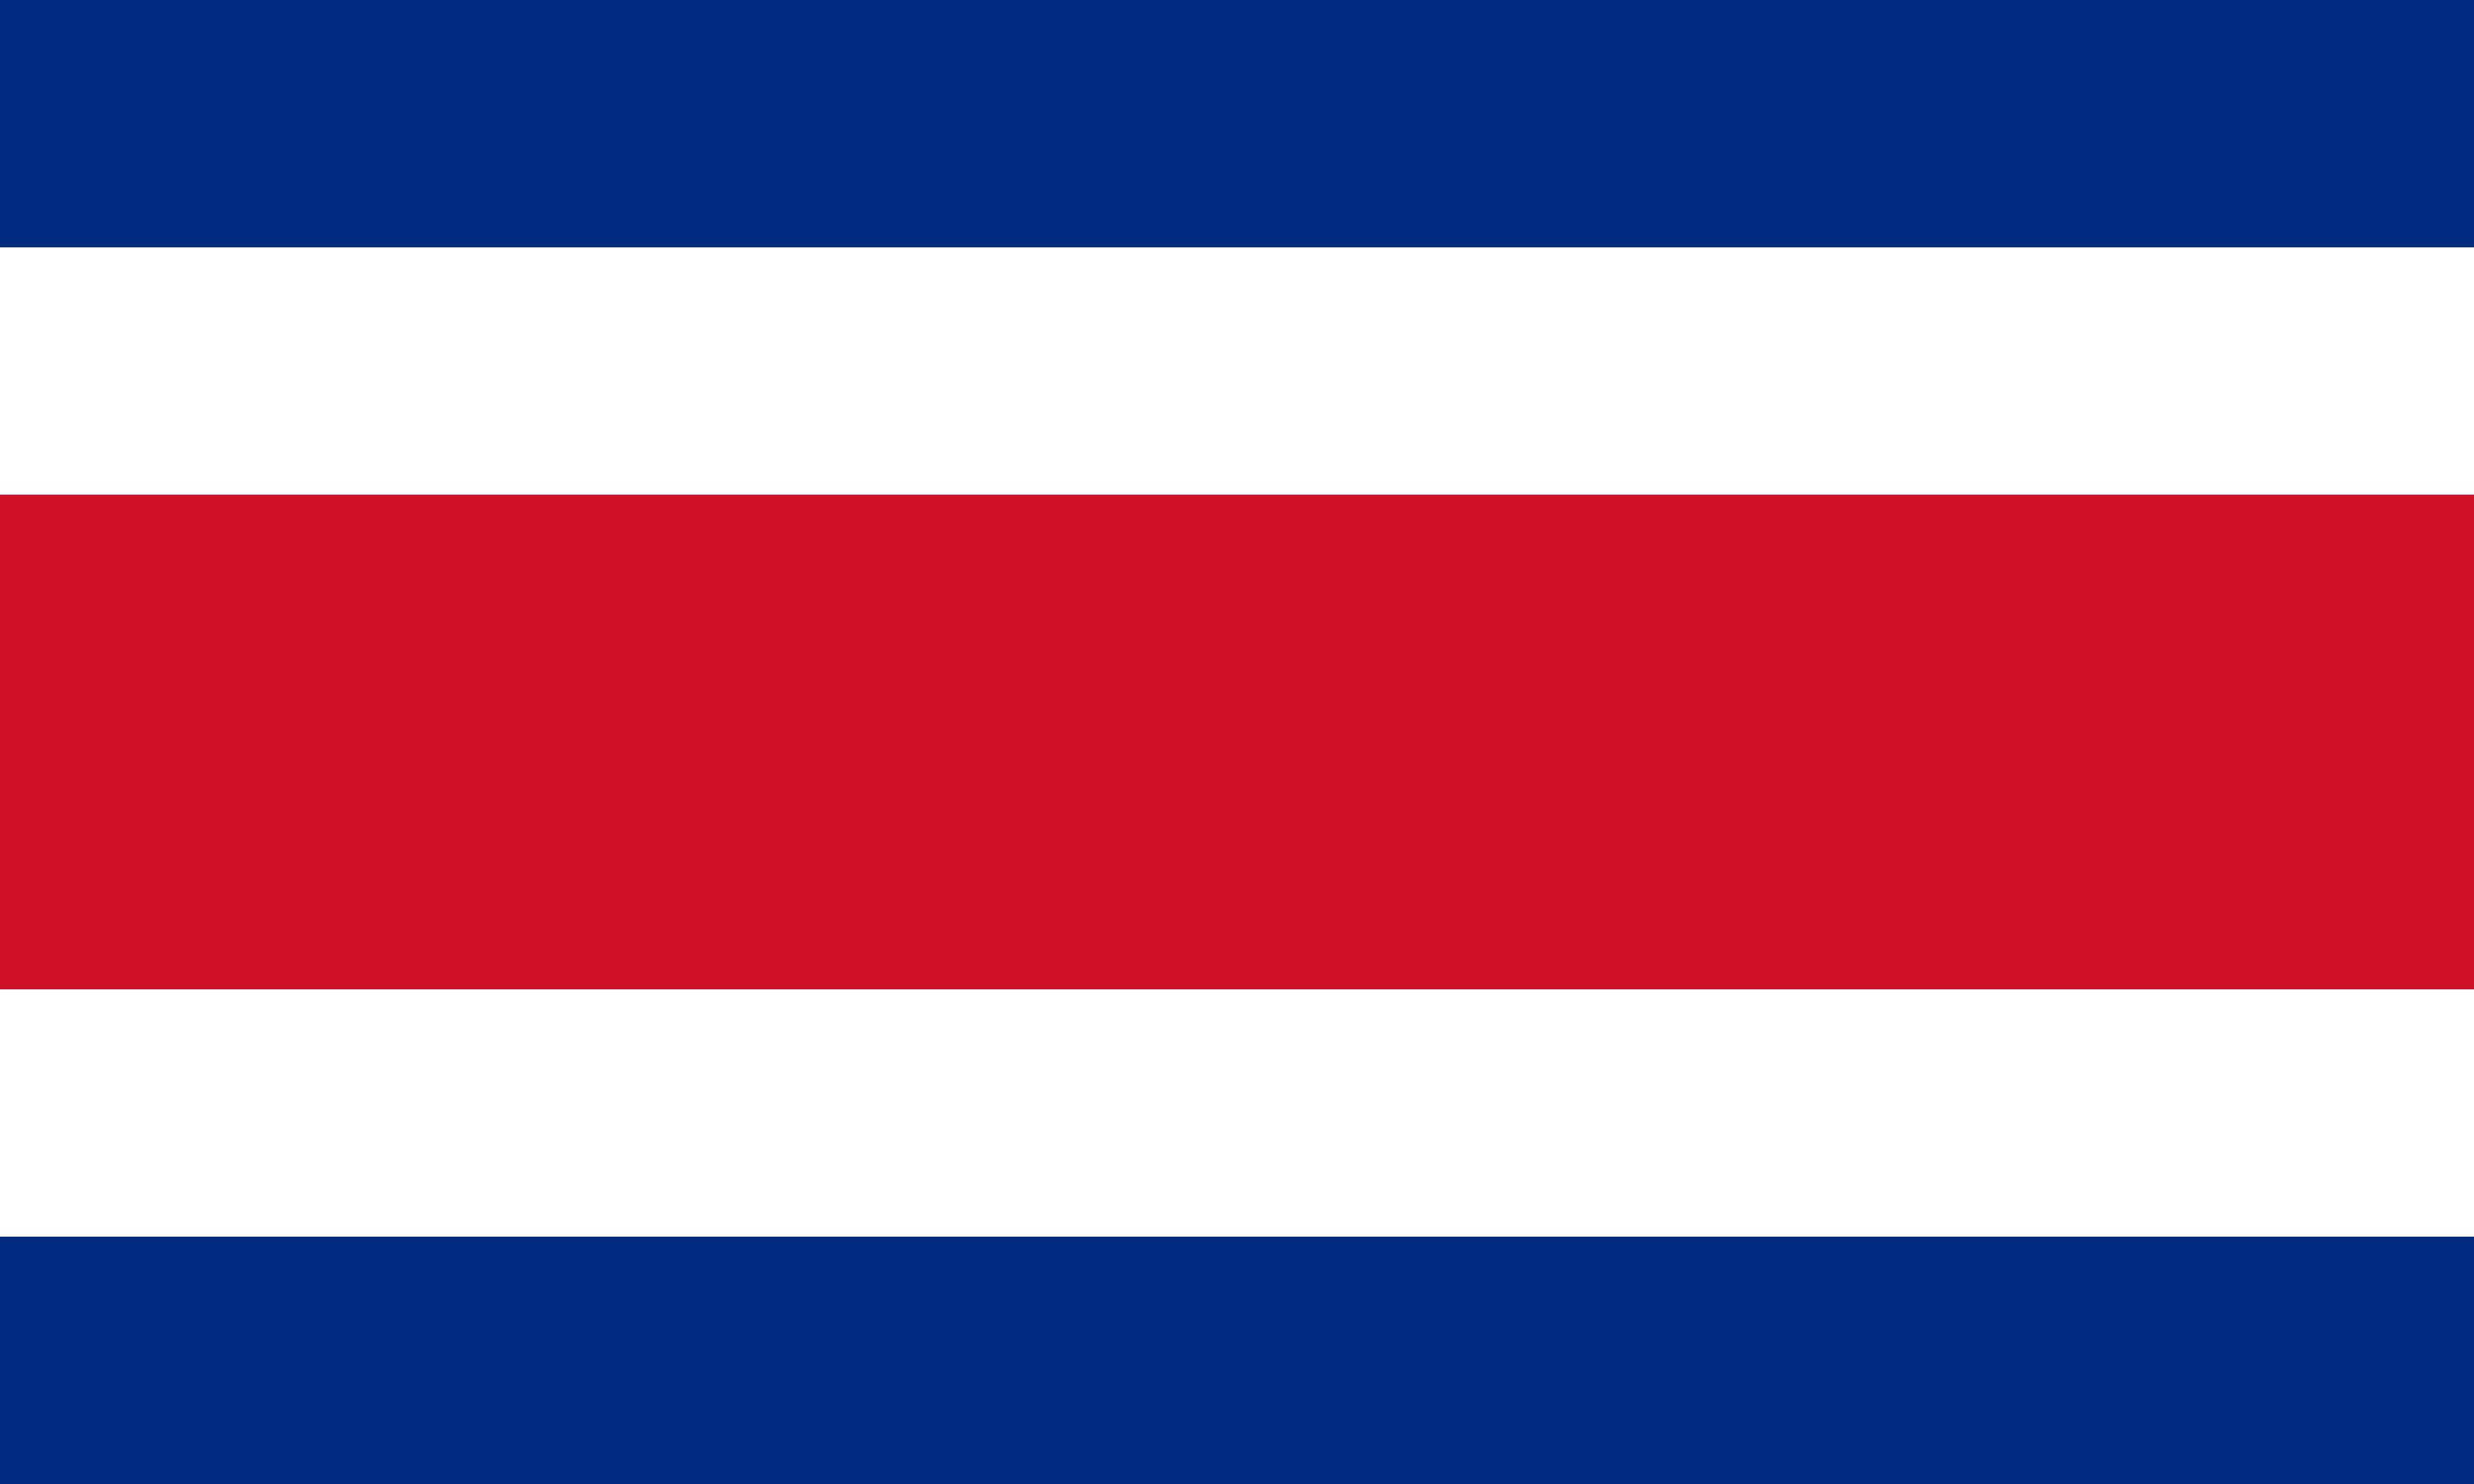 Bandeira da Costa Rica.